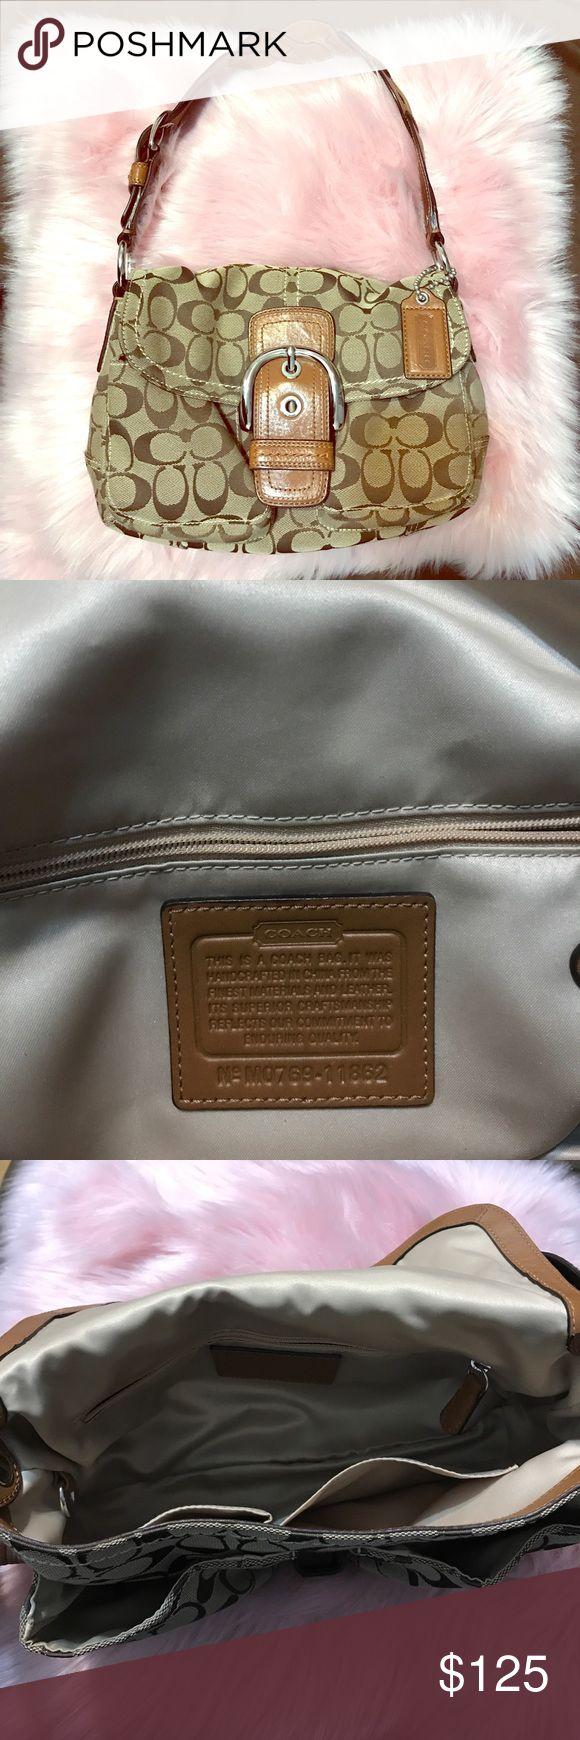 Authentic Coach purse In excellent condition no rips no tears super clean coach purse. Measures 12 x 7 Coach Bags Shoulder Bags